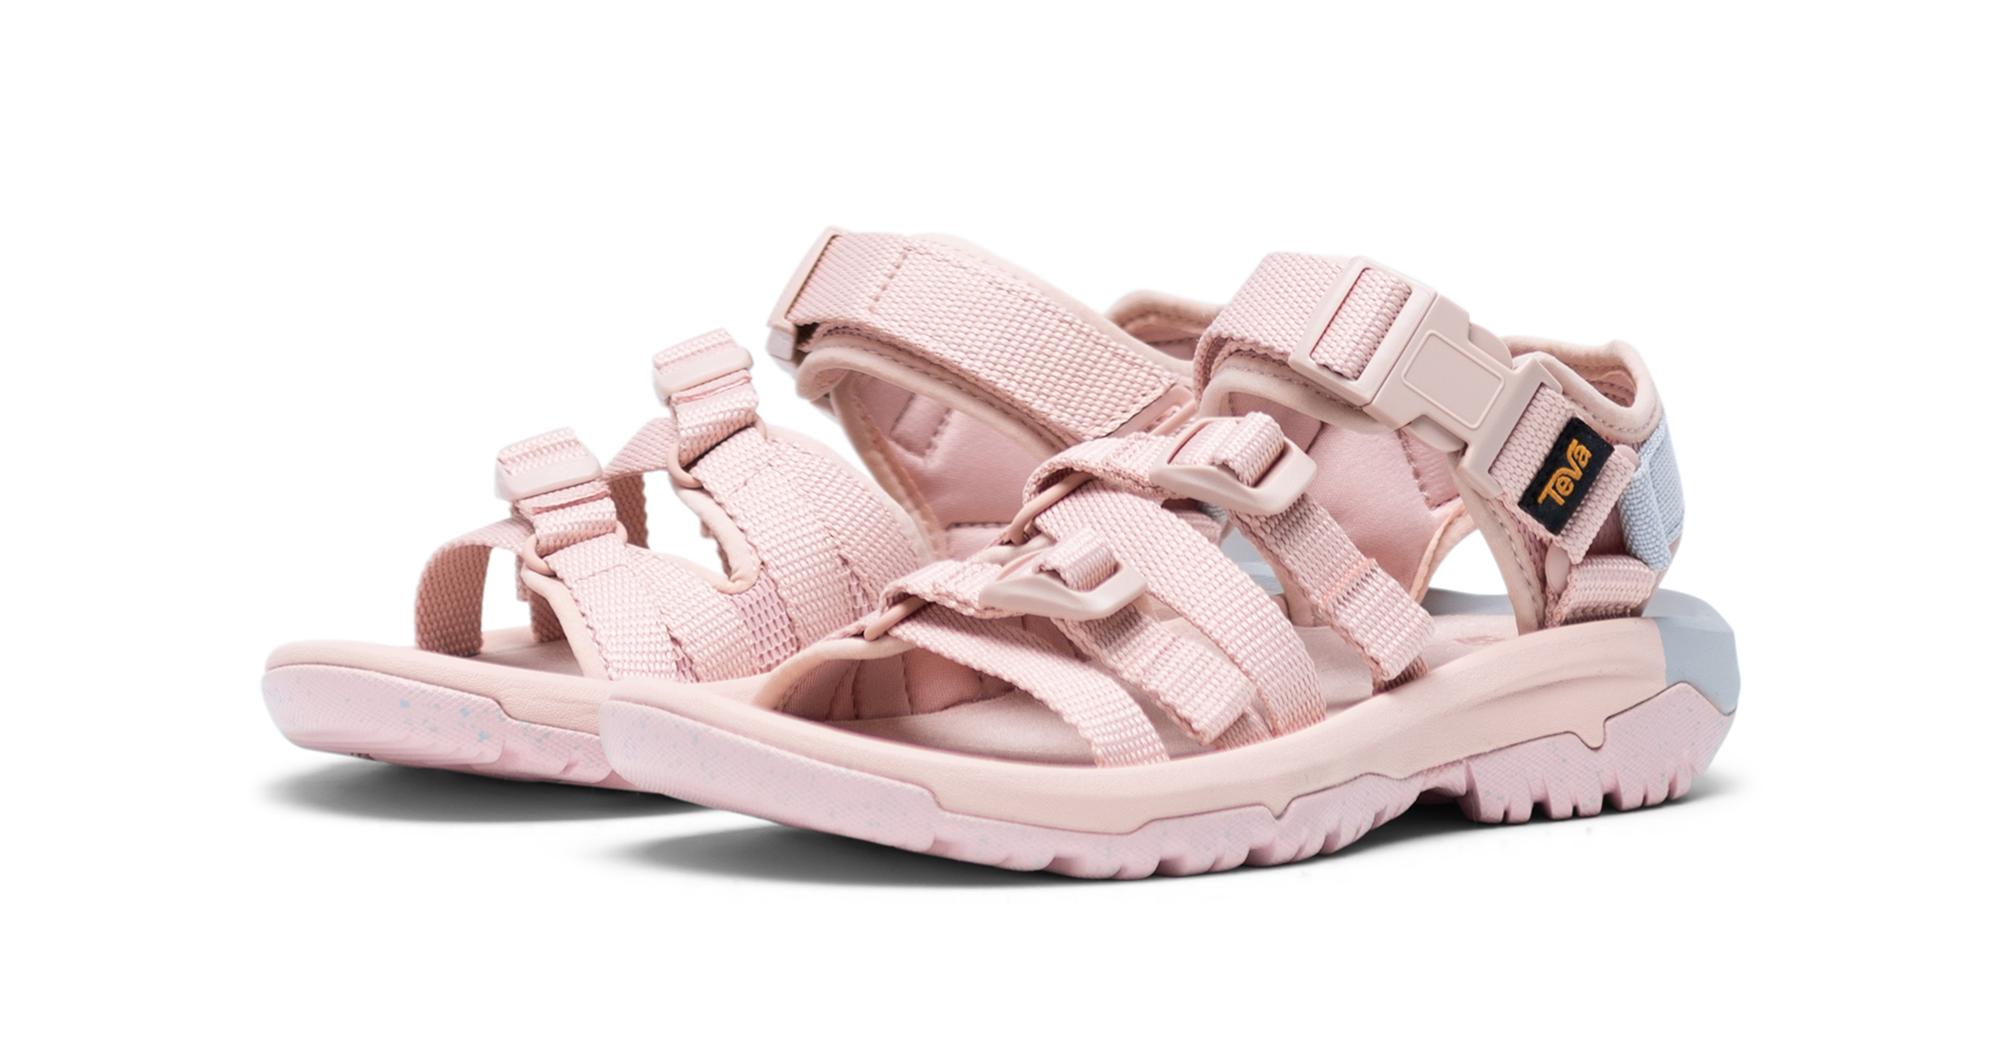 Womens Sport Sandals Like Teva Are A Big Designer Trend